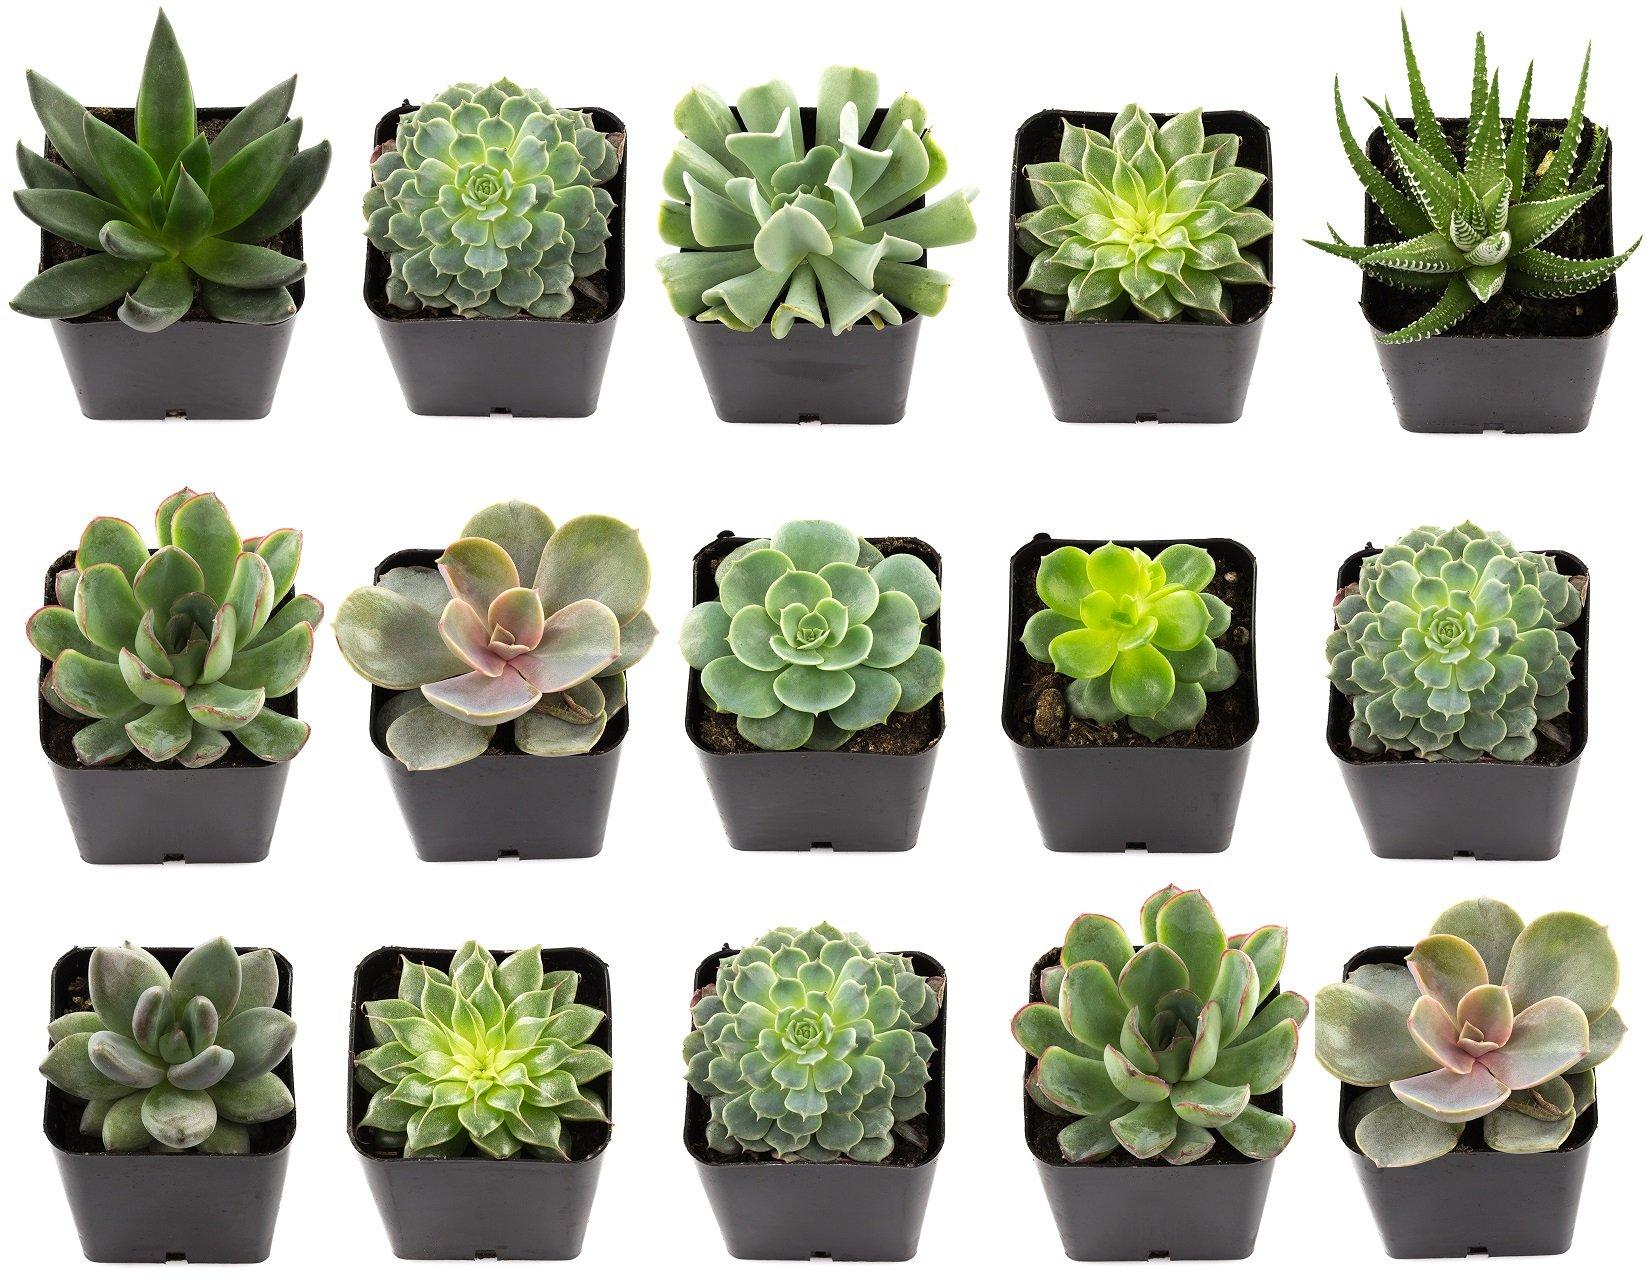 NW Wholesaler - Set of 15 Exotic 2.25'' Live Succulent Plants